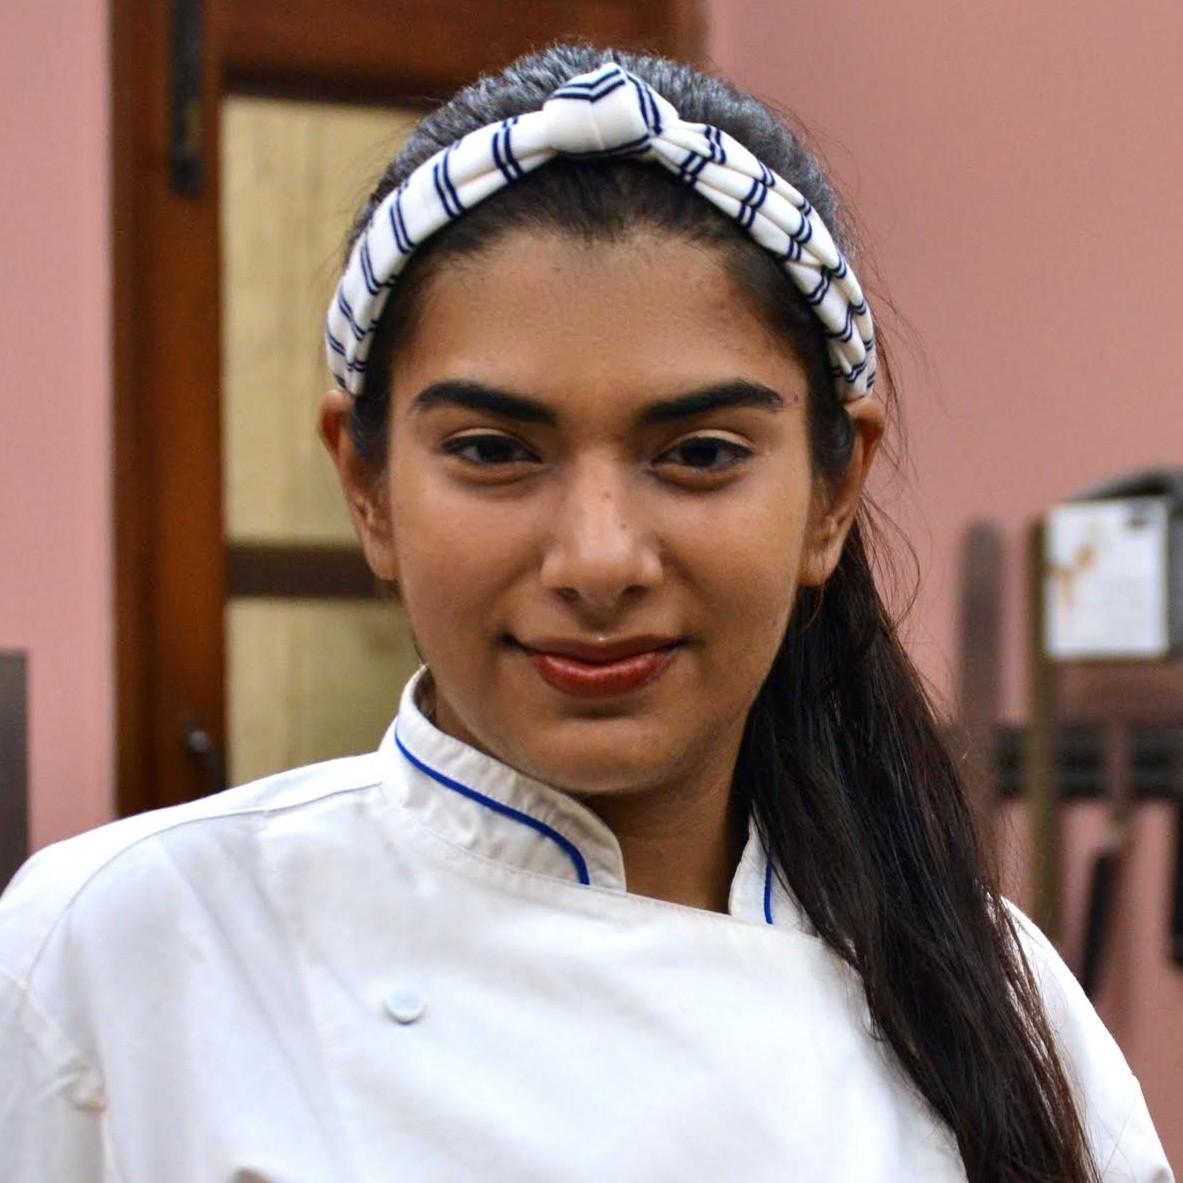 Bani Nanda food blogger